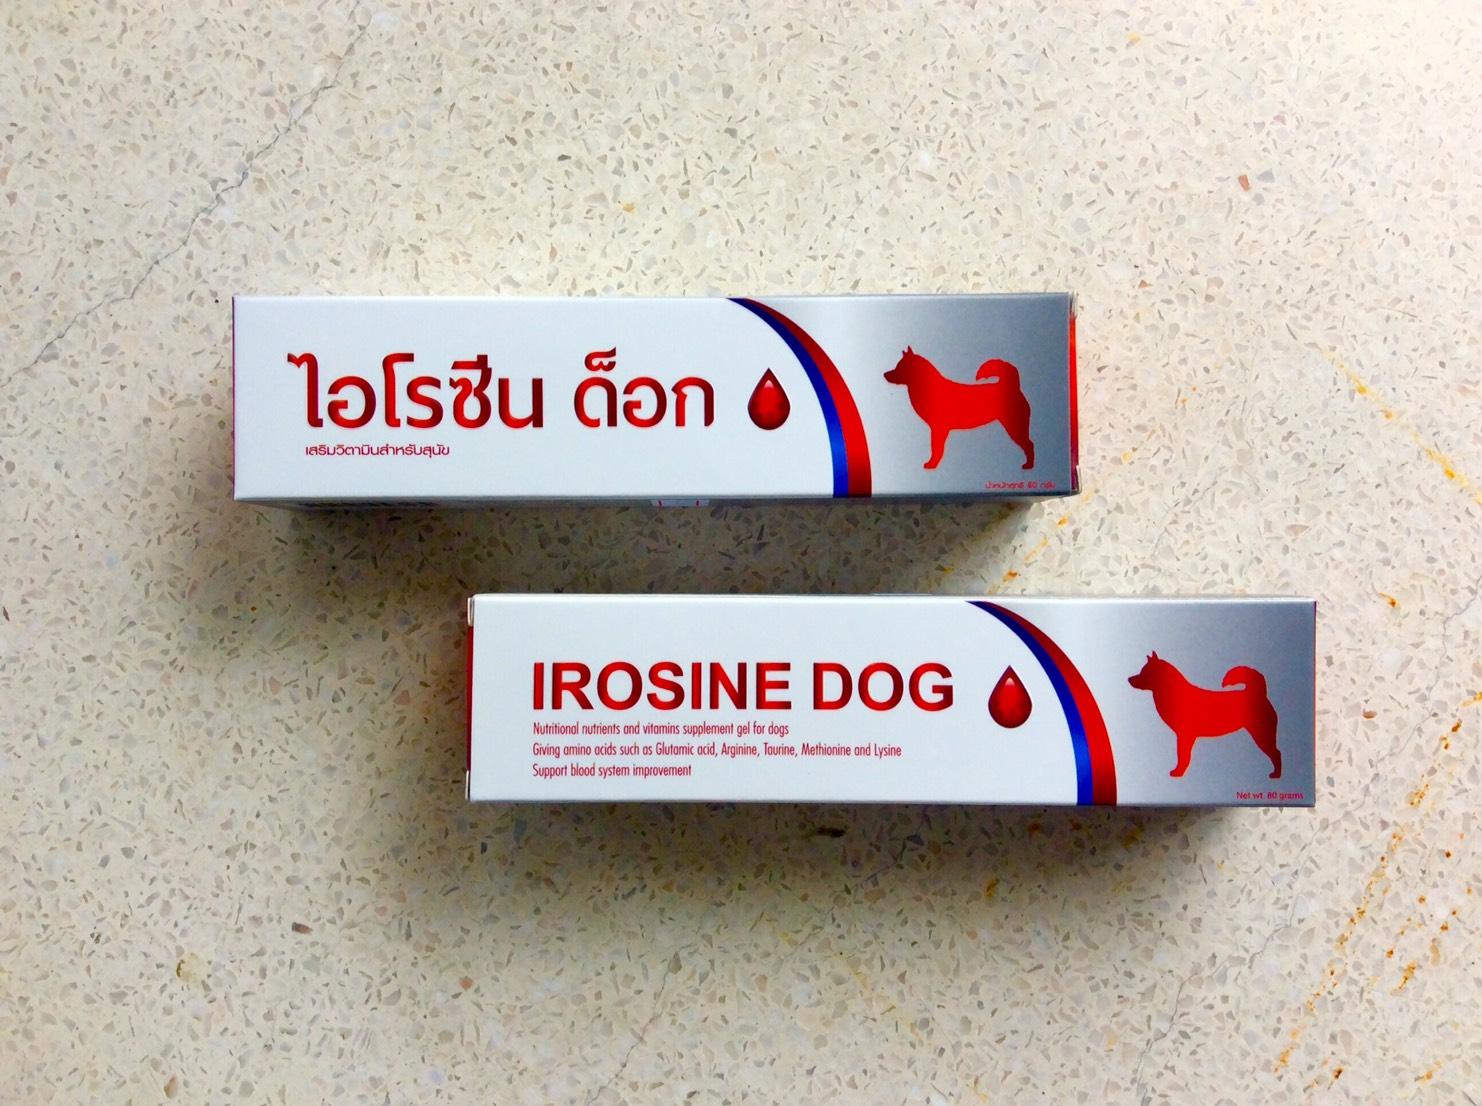 Irosine Dog (ไอโรซีน ด๊อก) (6 หลอด 990.-)